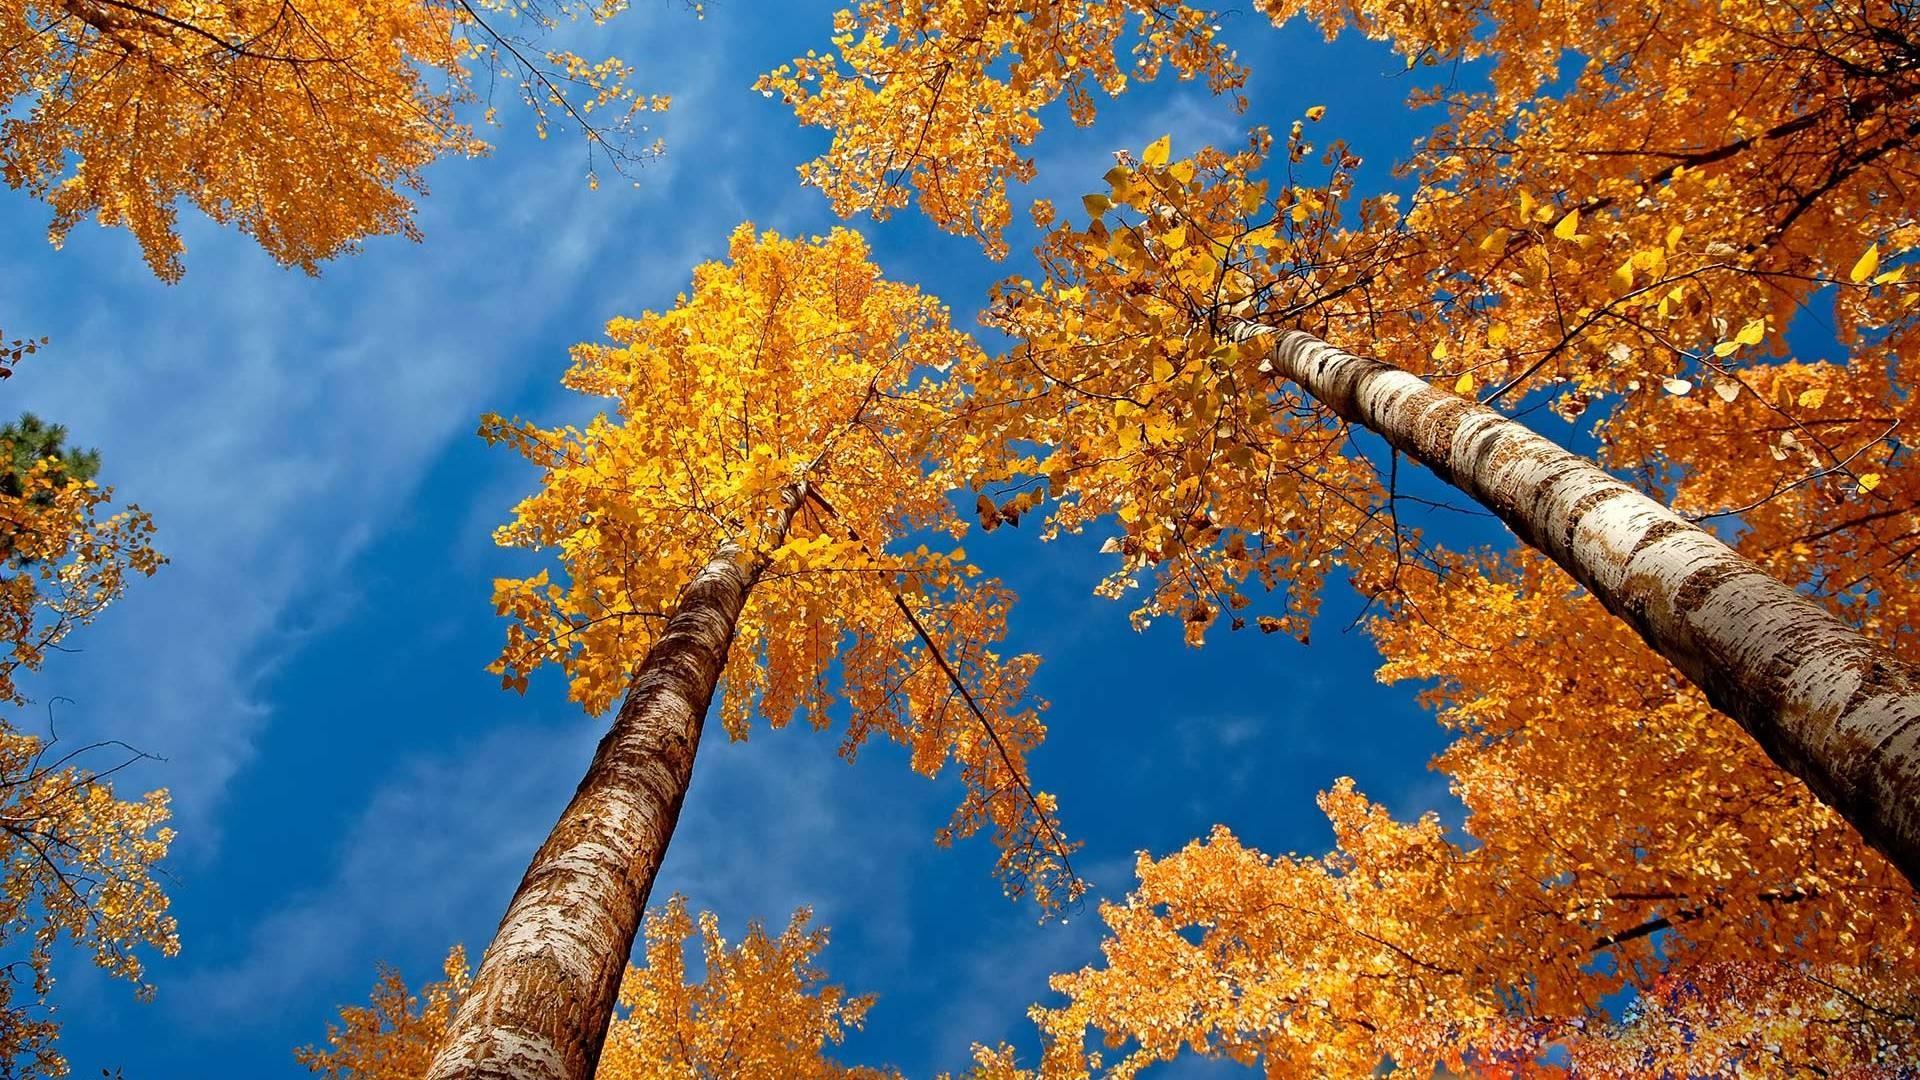 Autumn Desktop Wallpaper ① Download Free Stunning Full Hd